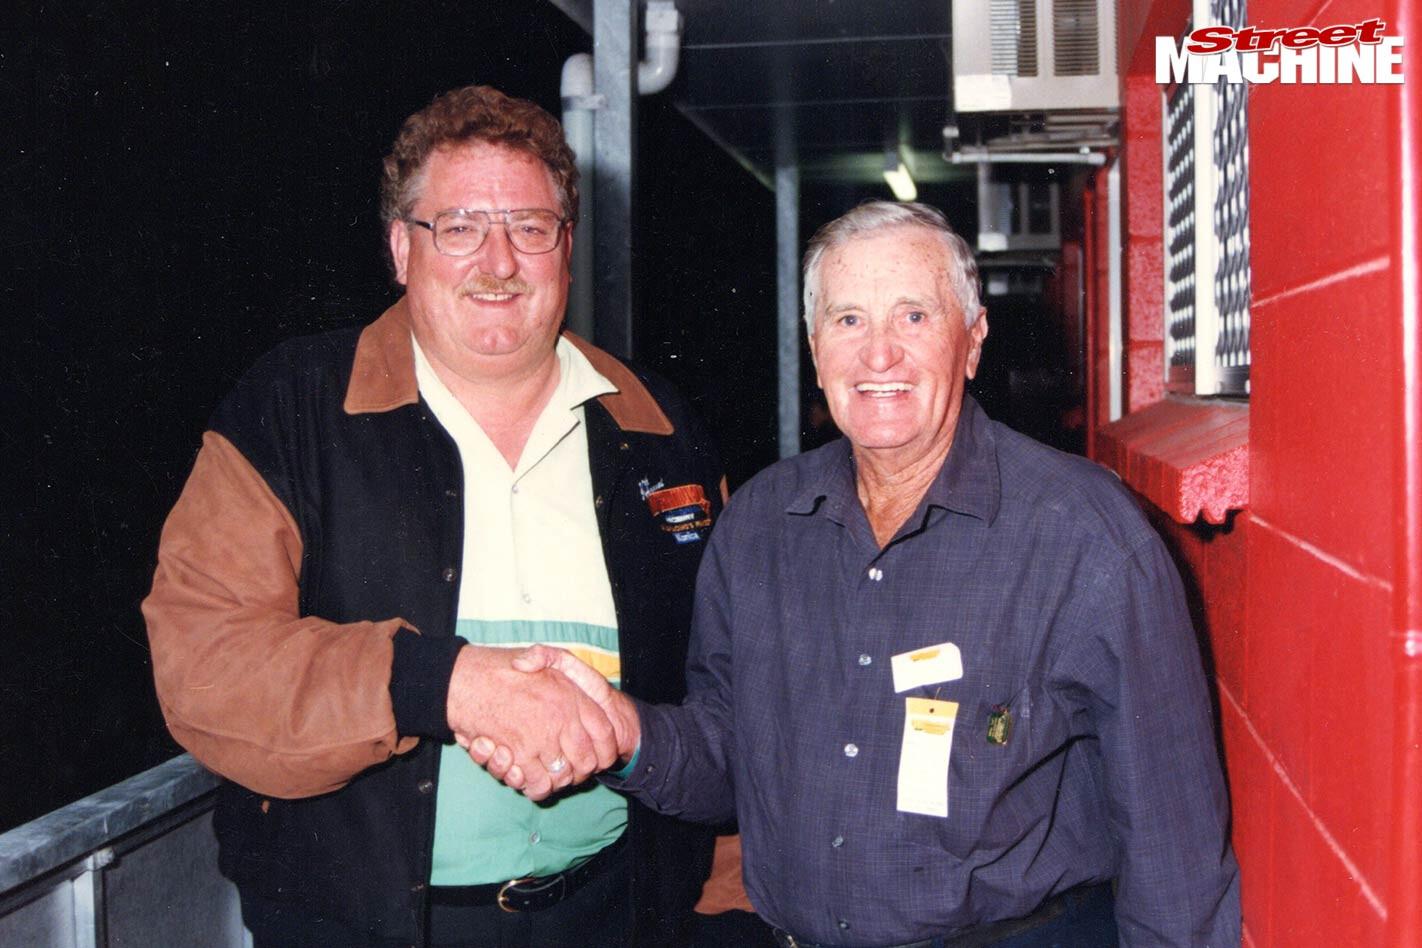 Stomper with Bill Gunn